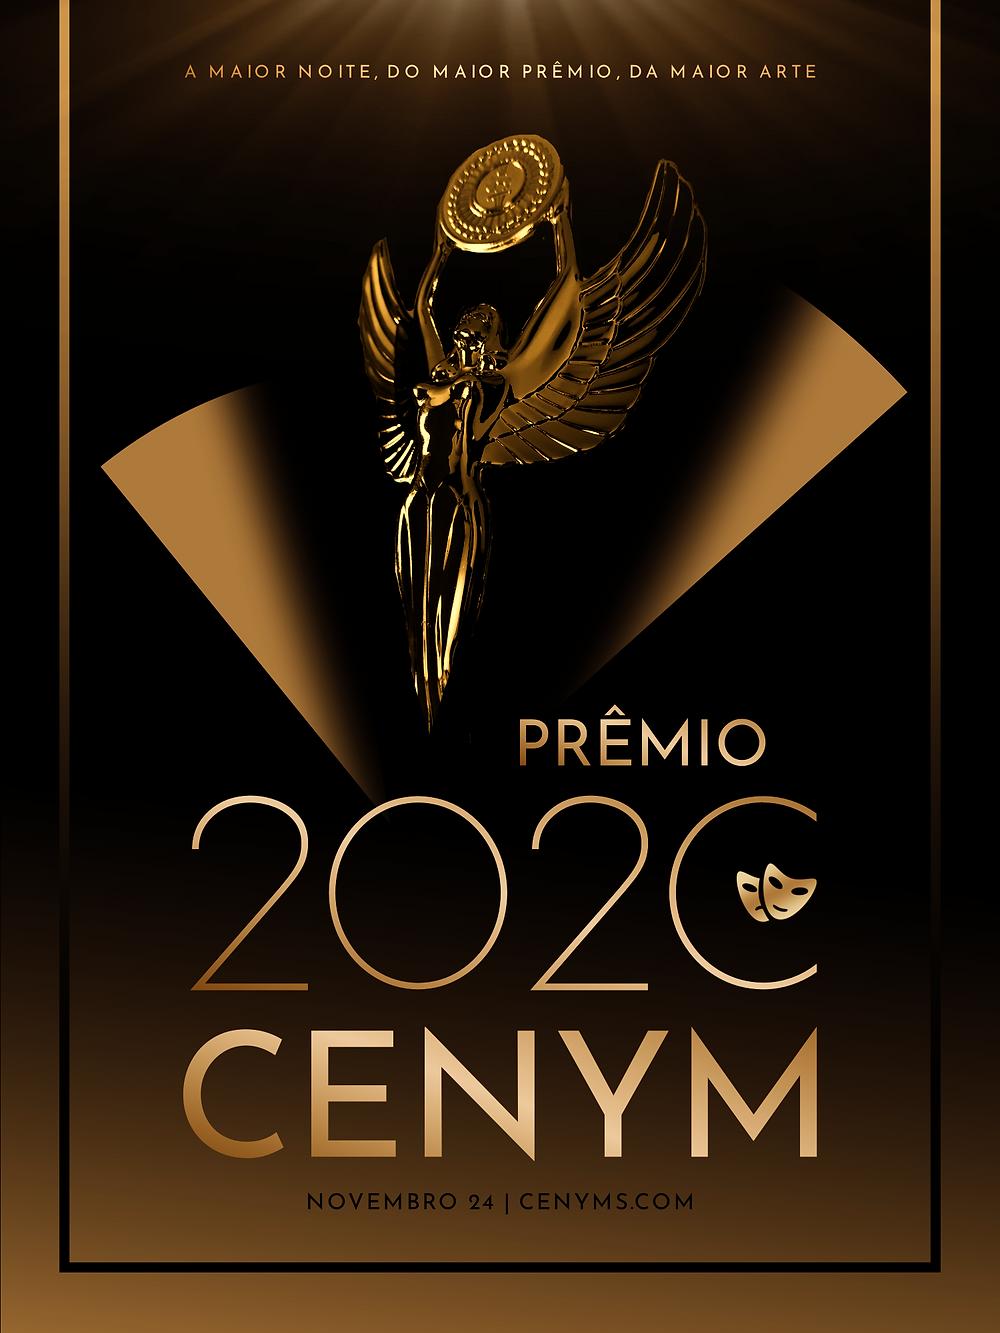 cenym 2020, prêmio cenym de teatro, teatro nacional, cenym